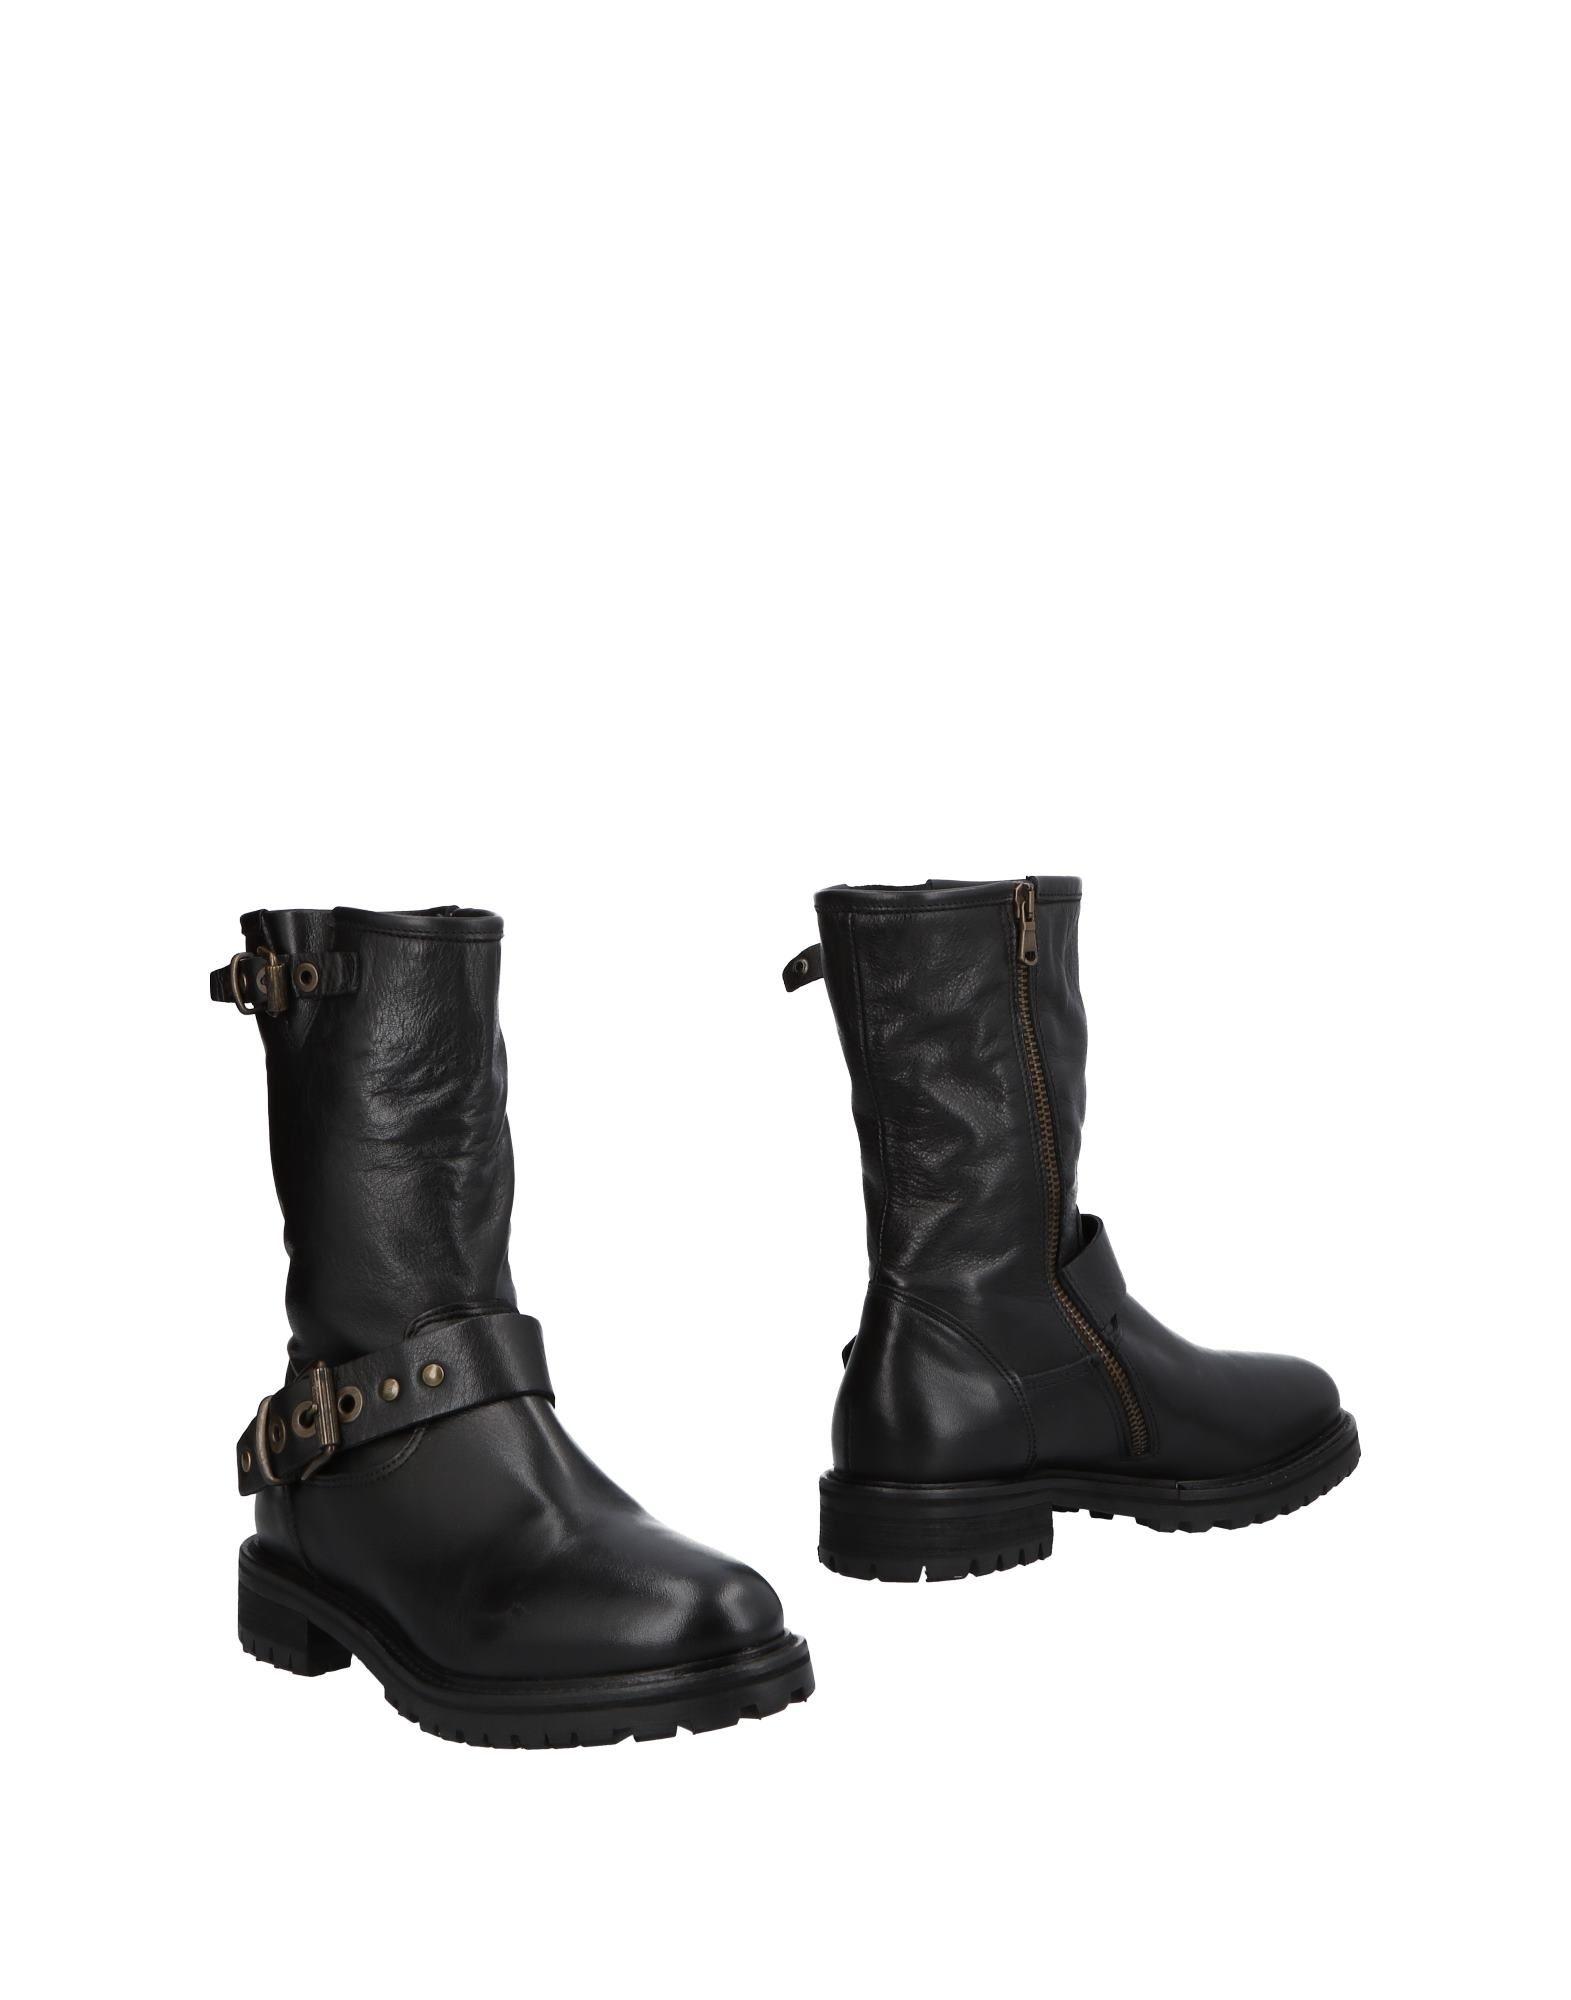 Keb Ankle Boot - Women Keb Ankle Boots online 11498023XN on  Australia - 11498023XN online 64d32b